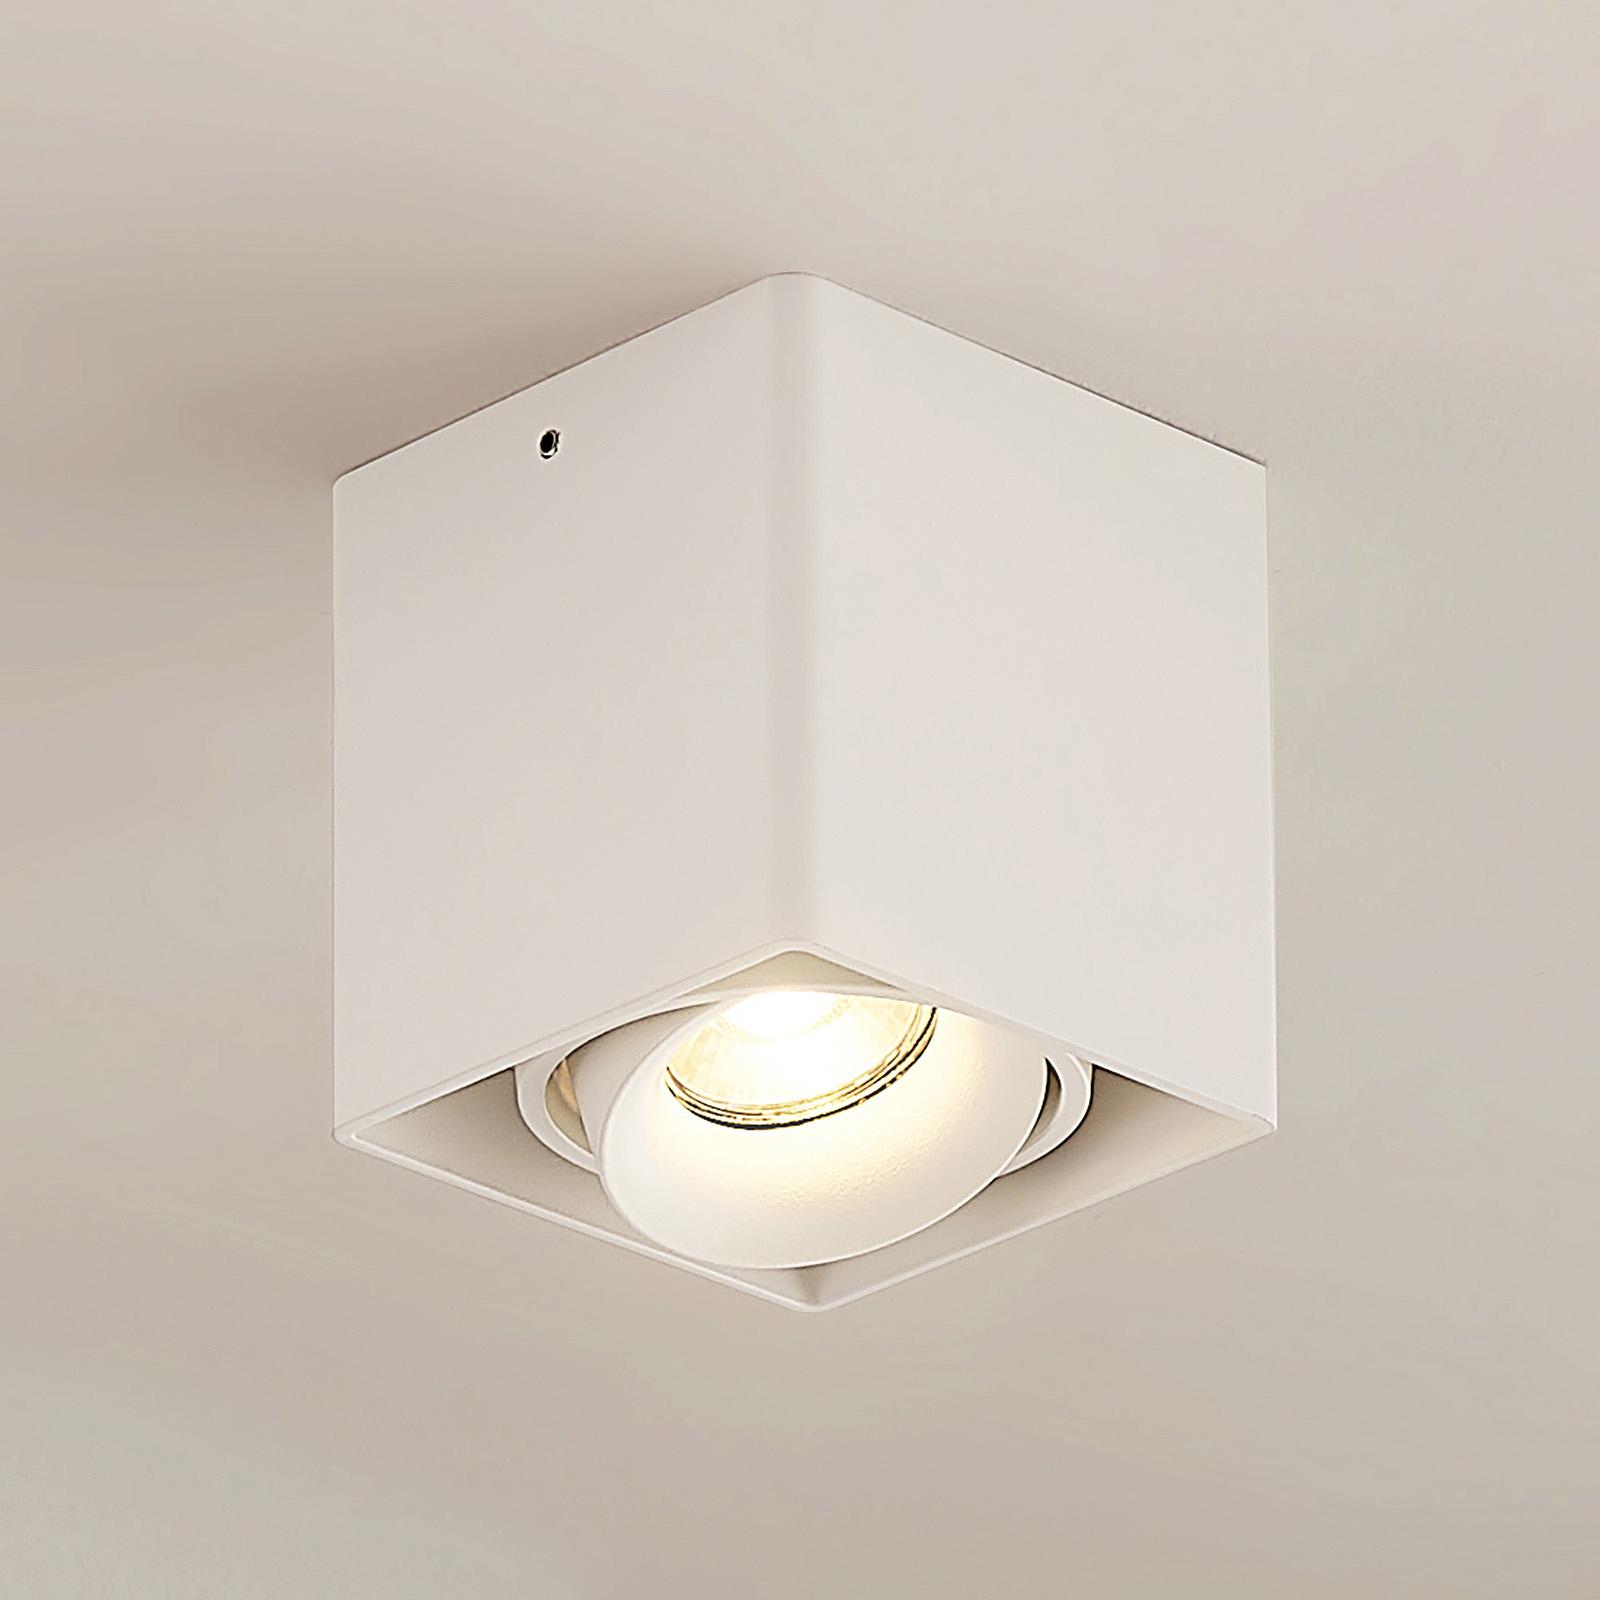 Arcchio Kubika downlight GU10 à 1 lampe, blanc